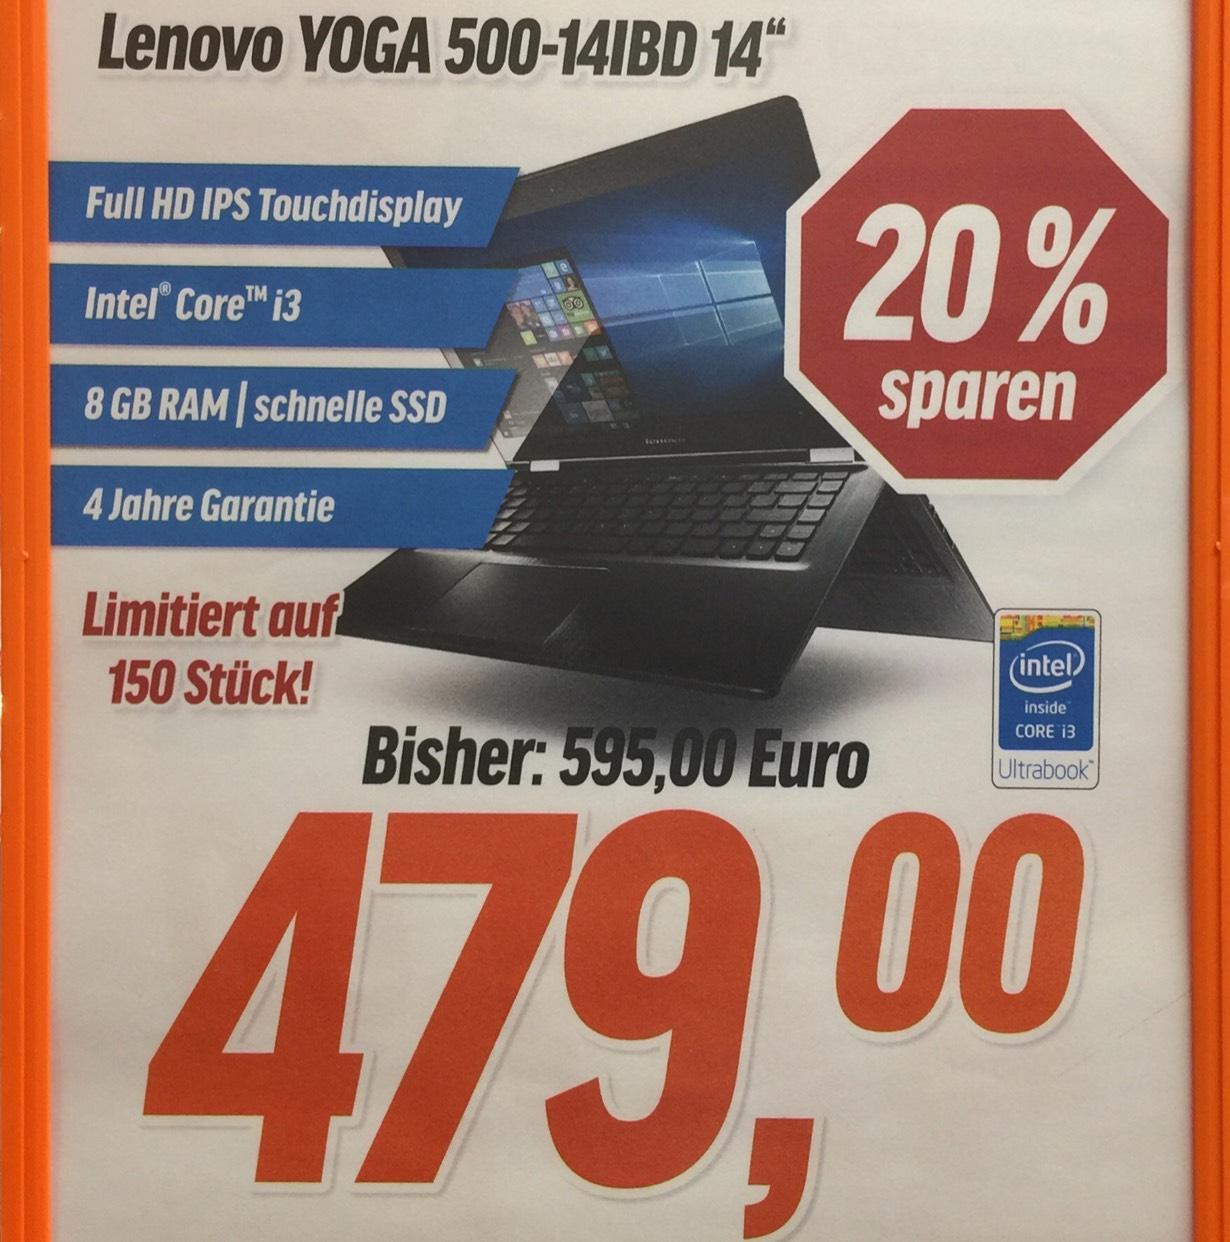 "[NBB lokal Hamburg] Lenovo Yoga 500-14IBD für 479€ (14"" Full-HD IPS Widescreen Touch, i3-5005U, 8 GB RAM, 128 GB SSD, Win 10, 4 Jahre Garantie)"